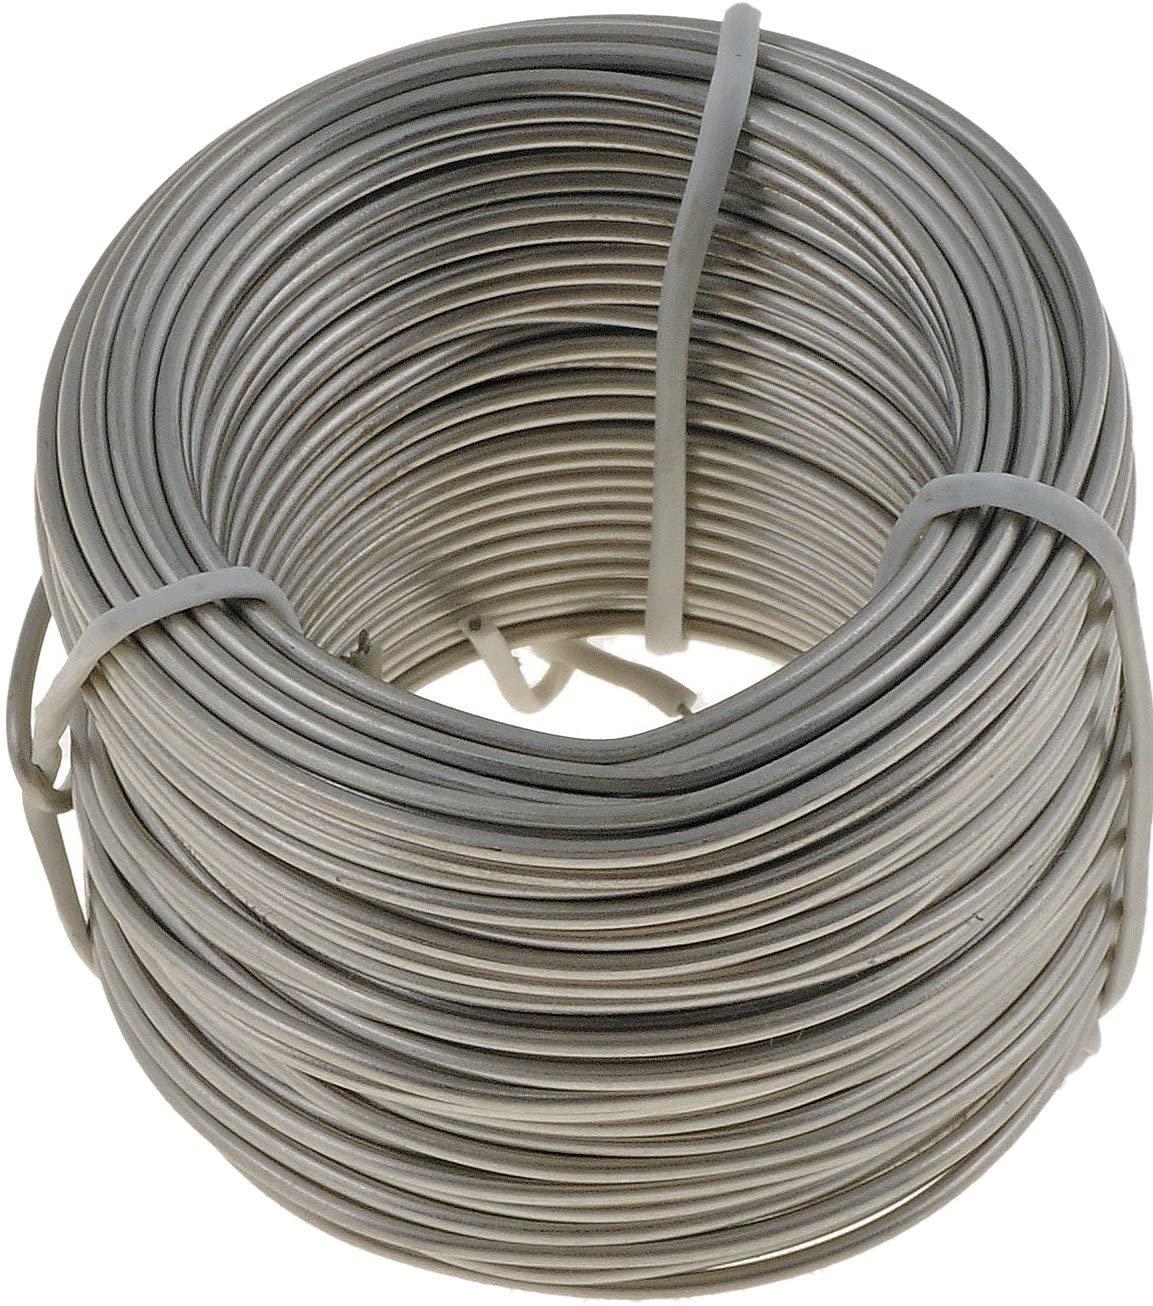 Dorman (10161) 19 Gauge Stainless Steel Mechanics Wire, 50 Feet